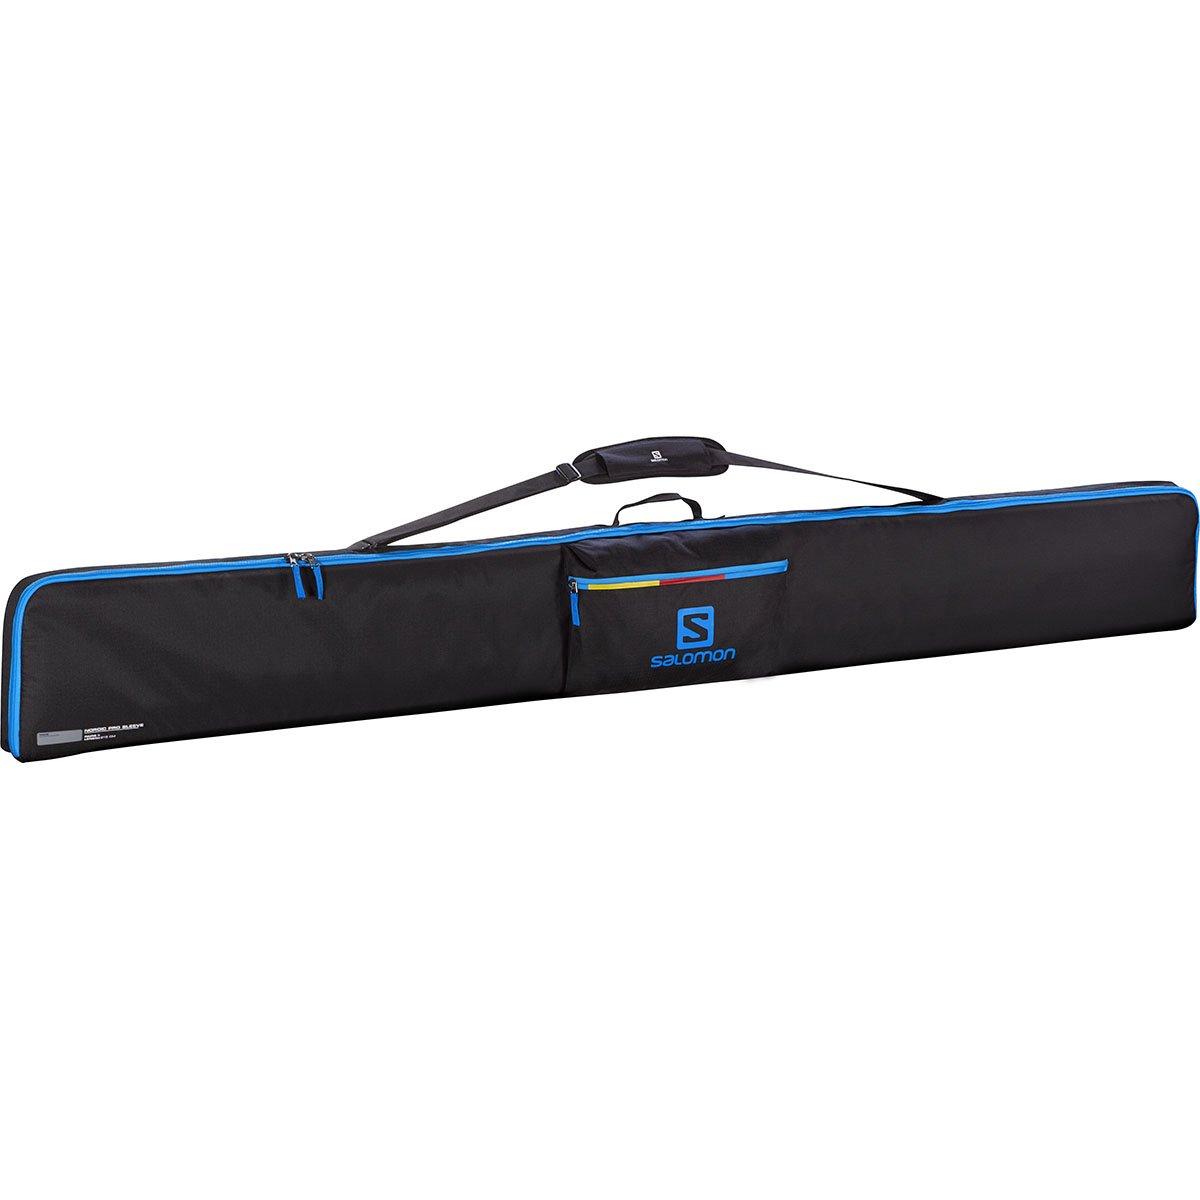 Salomon Nordic 3 Pairs 215 Pro Sleeve Funda para ski, Unisex Adulto, Negro (Black/Process Blue/Corona Yellow), Talla Ú nica Talla Única L38298200